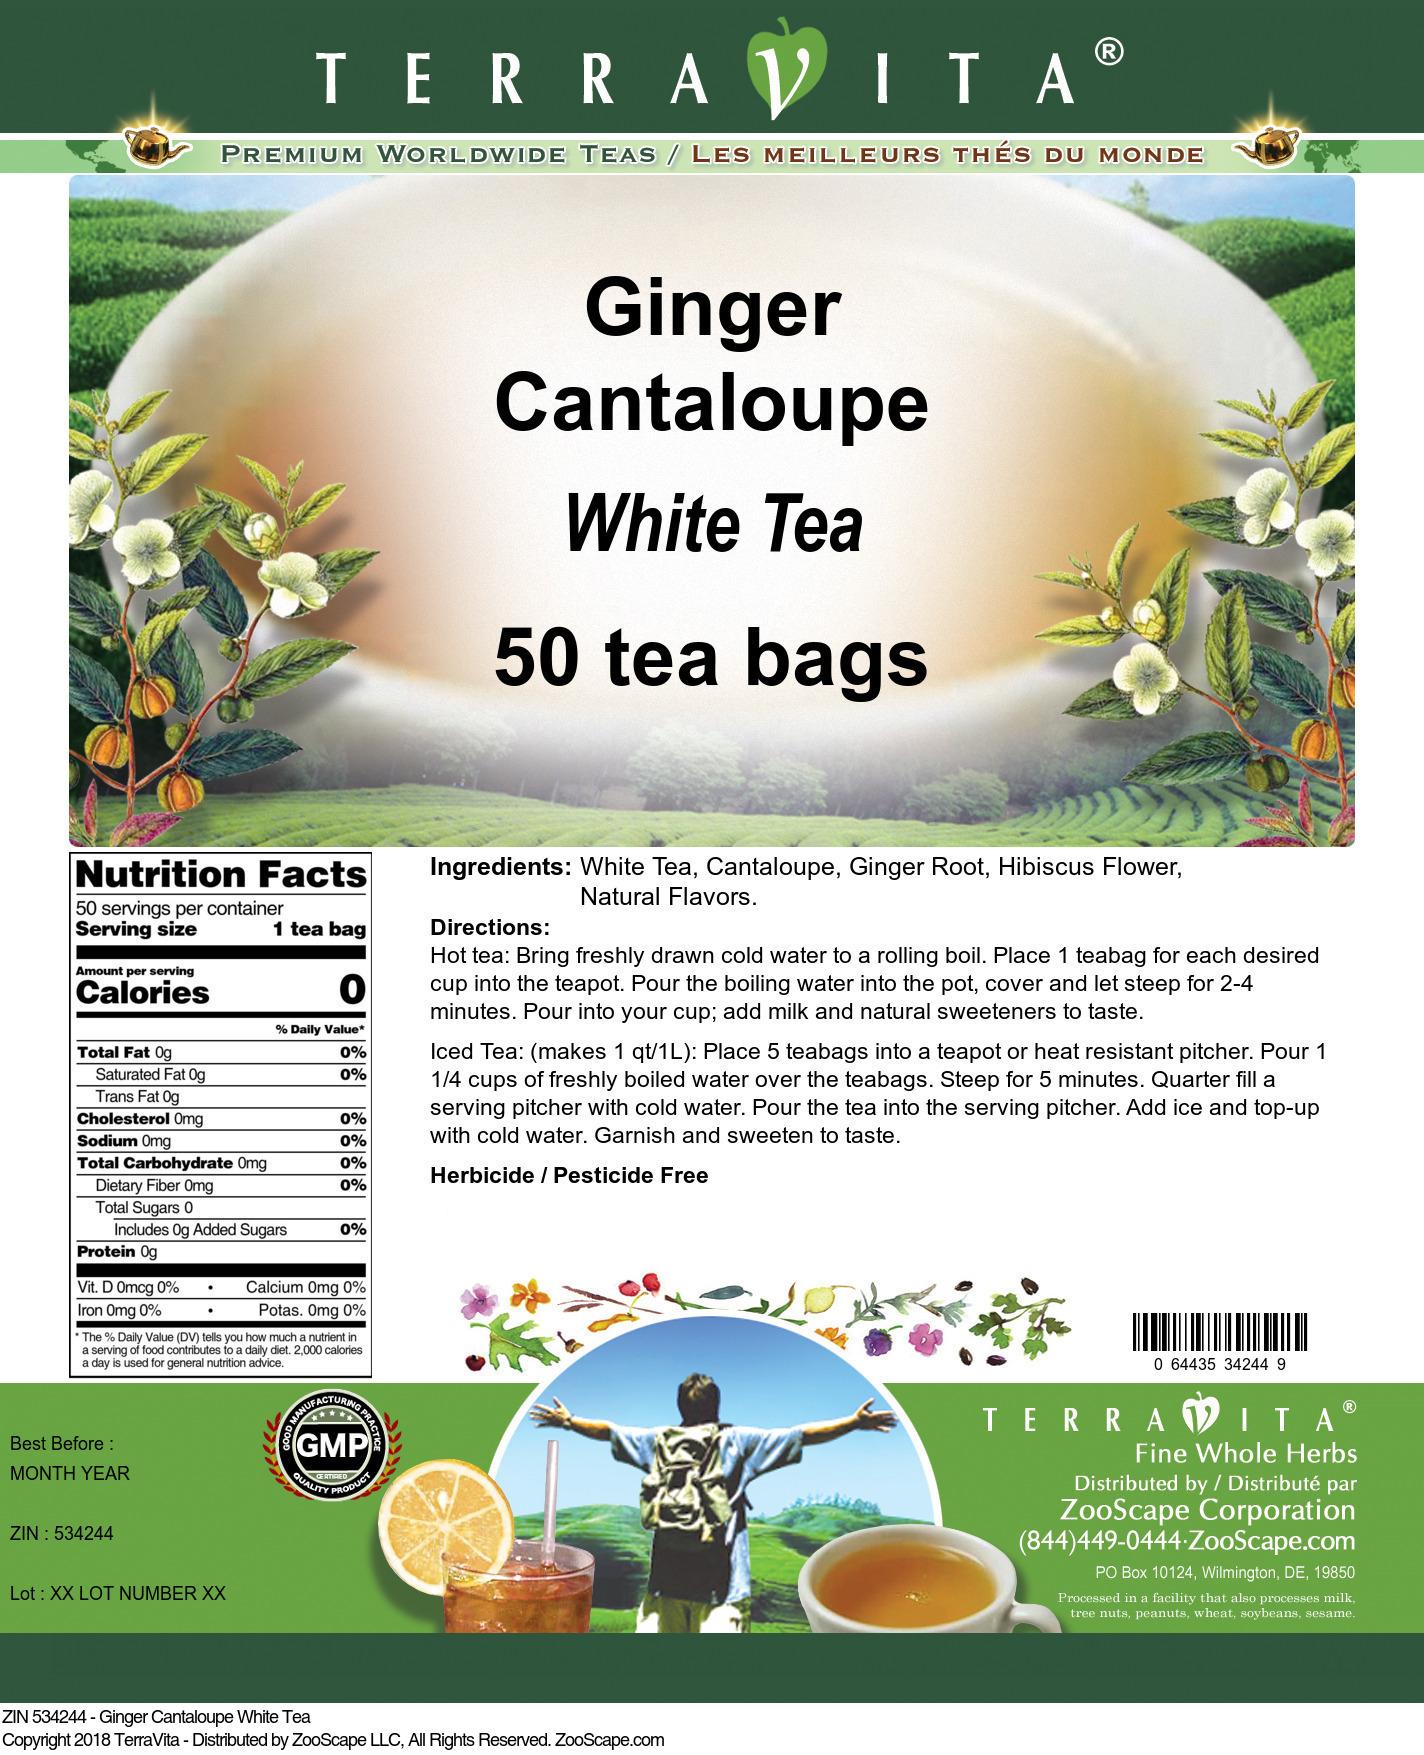 Ginger Cantaloupe White Tea